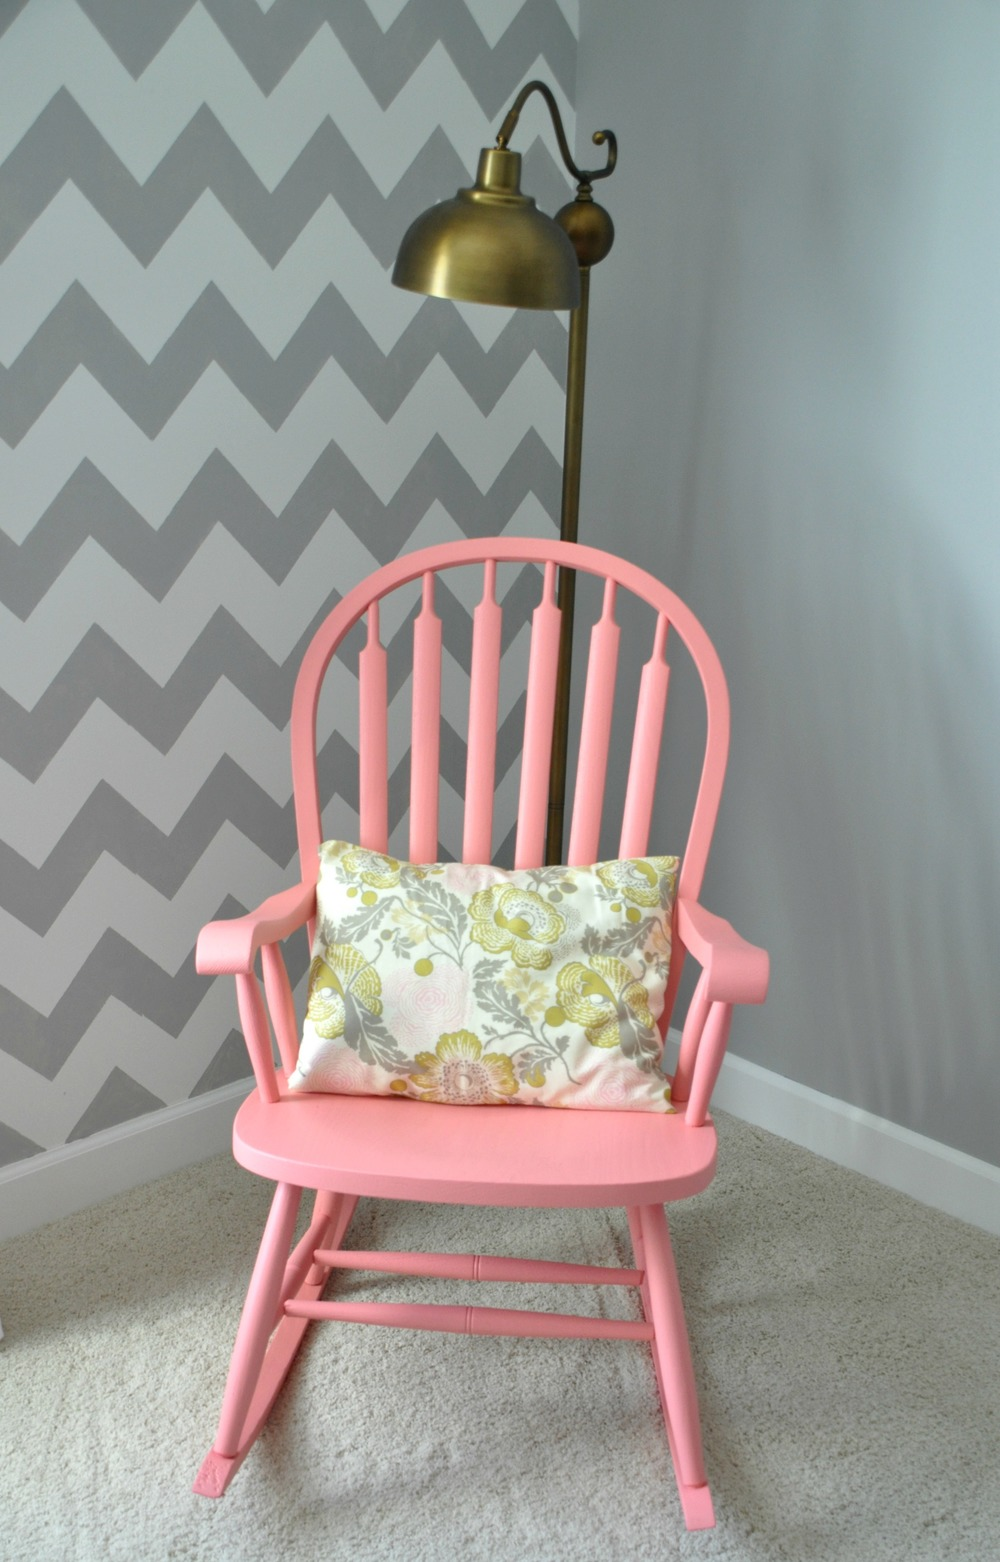 Painted Rocking Chair, Chevron Wall, Gold Lamp.jpg